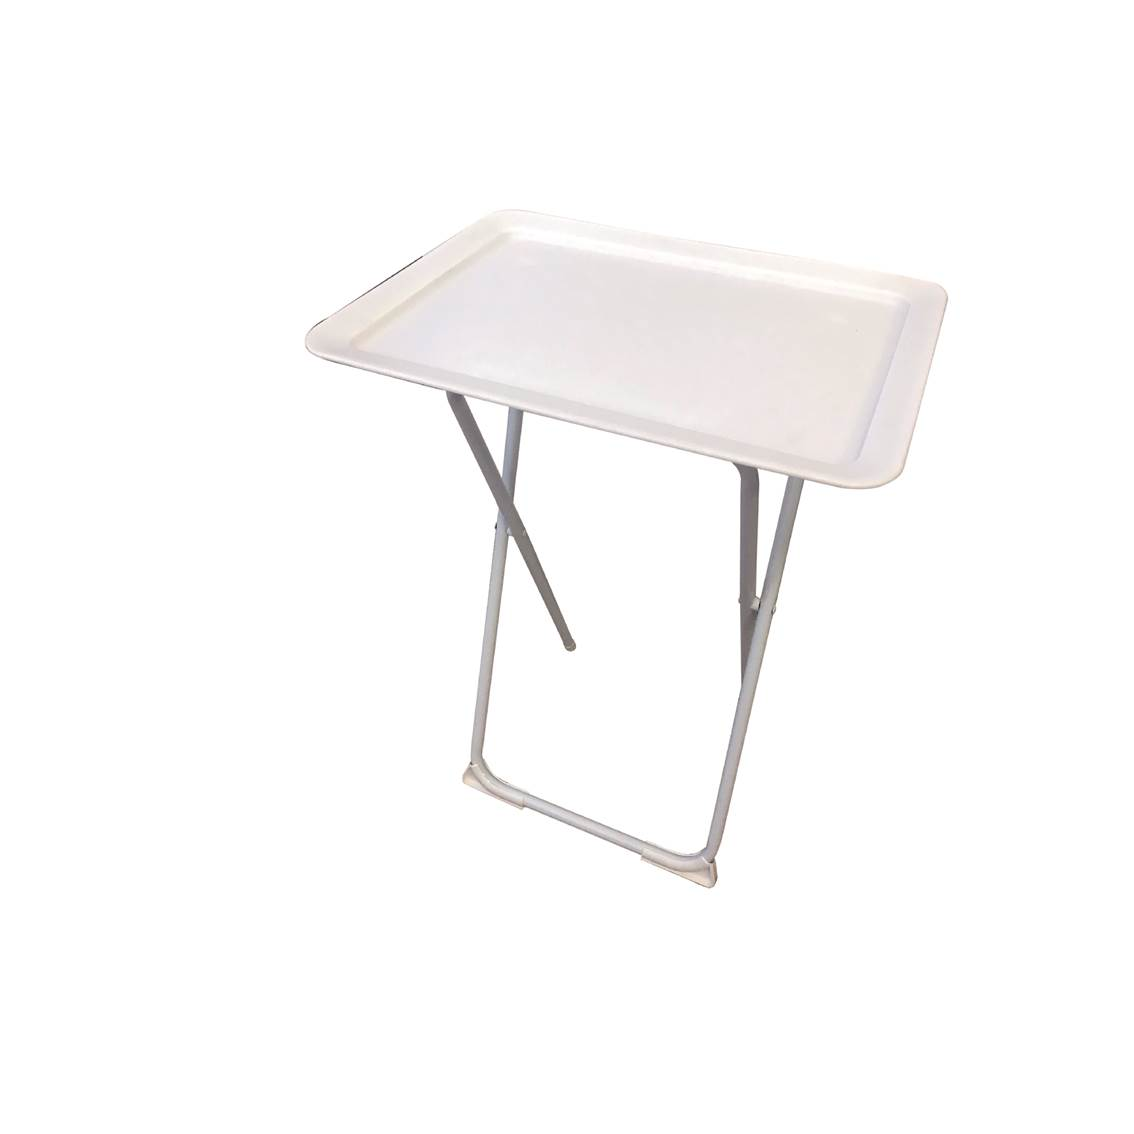 Japanhome塑料面摺檯(白色)